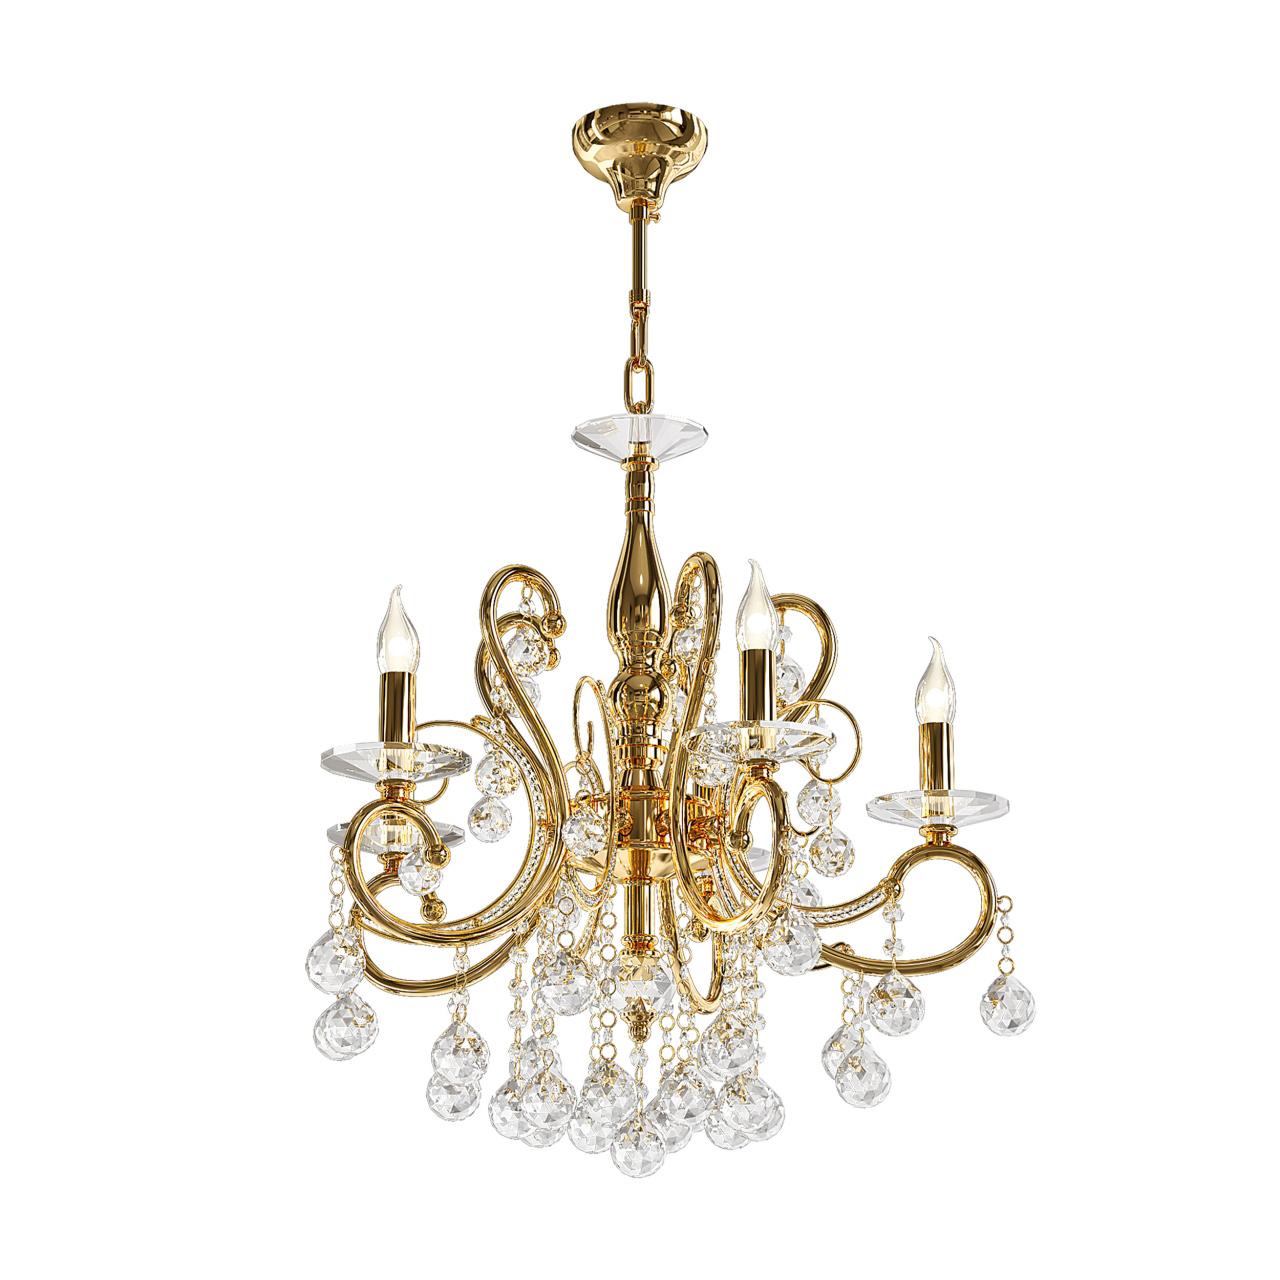 Люстра подвесная Elegante 5х60W E14 24K золото Osgona 708052